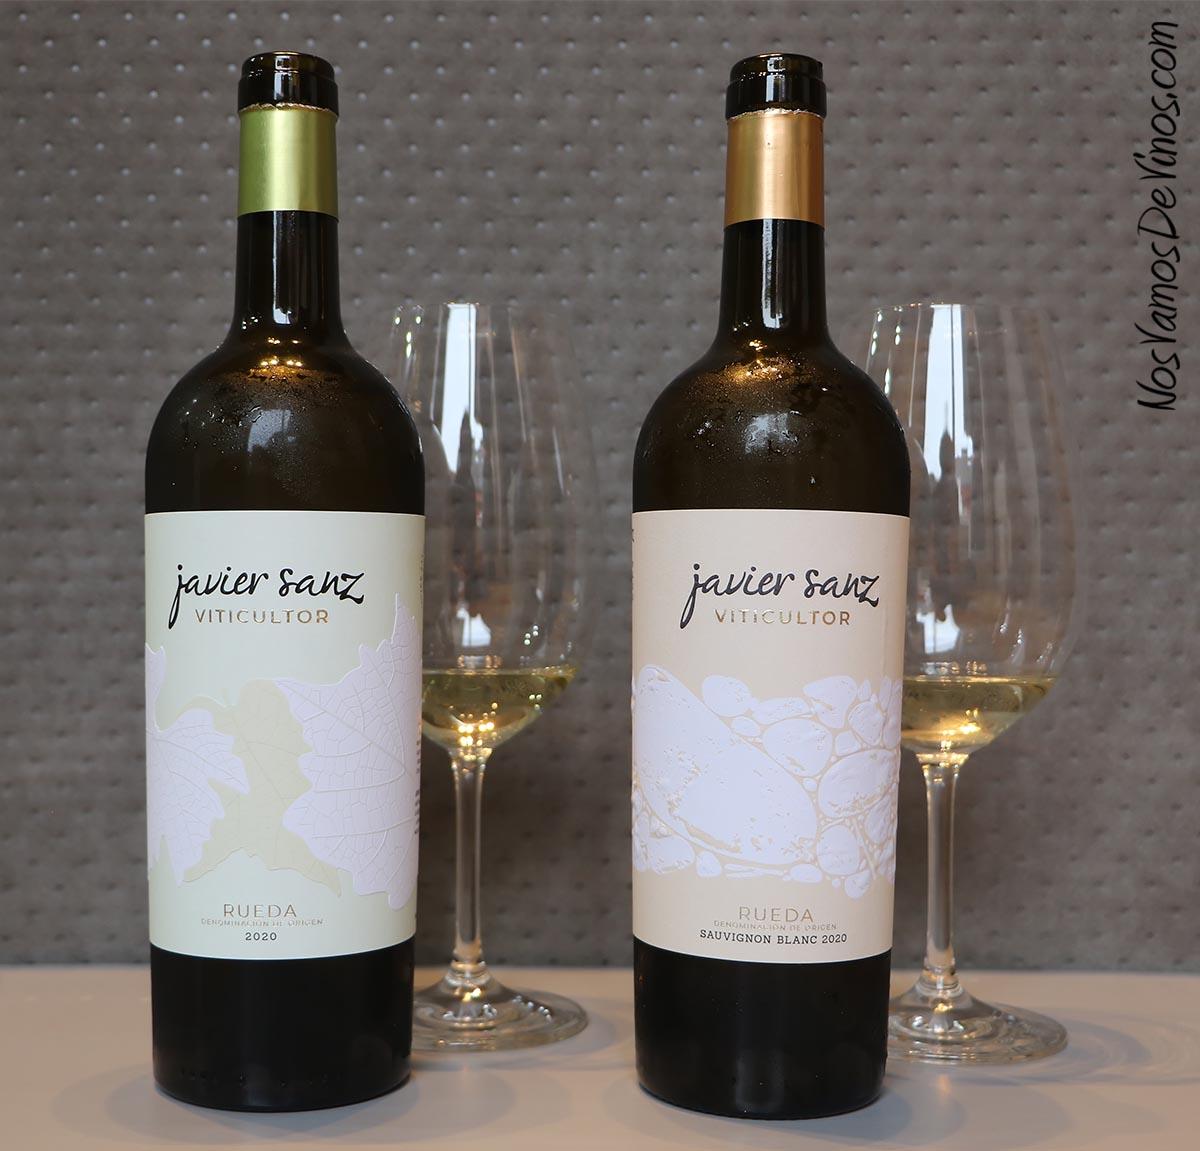 Javier Sanz Viticultor Verdejo 2020 & Javier Sanz Sauvignon Blanc 2020